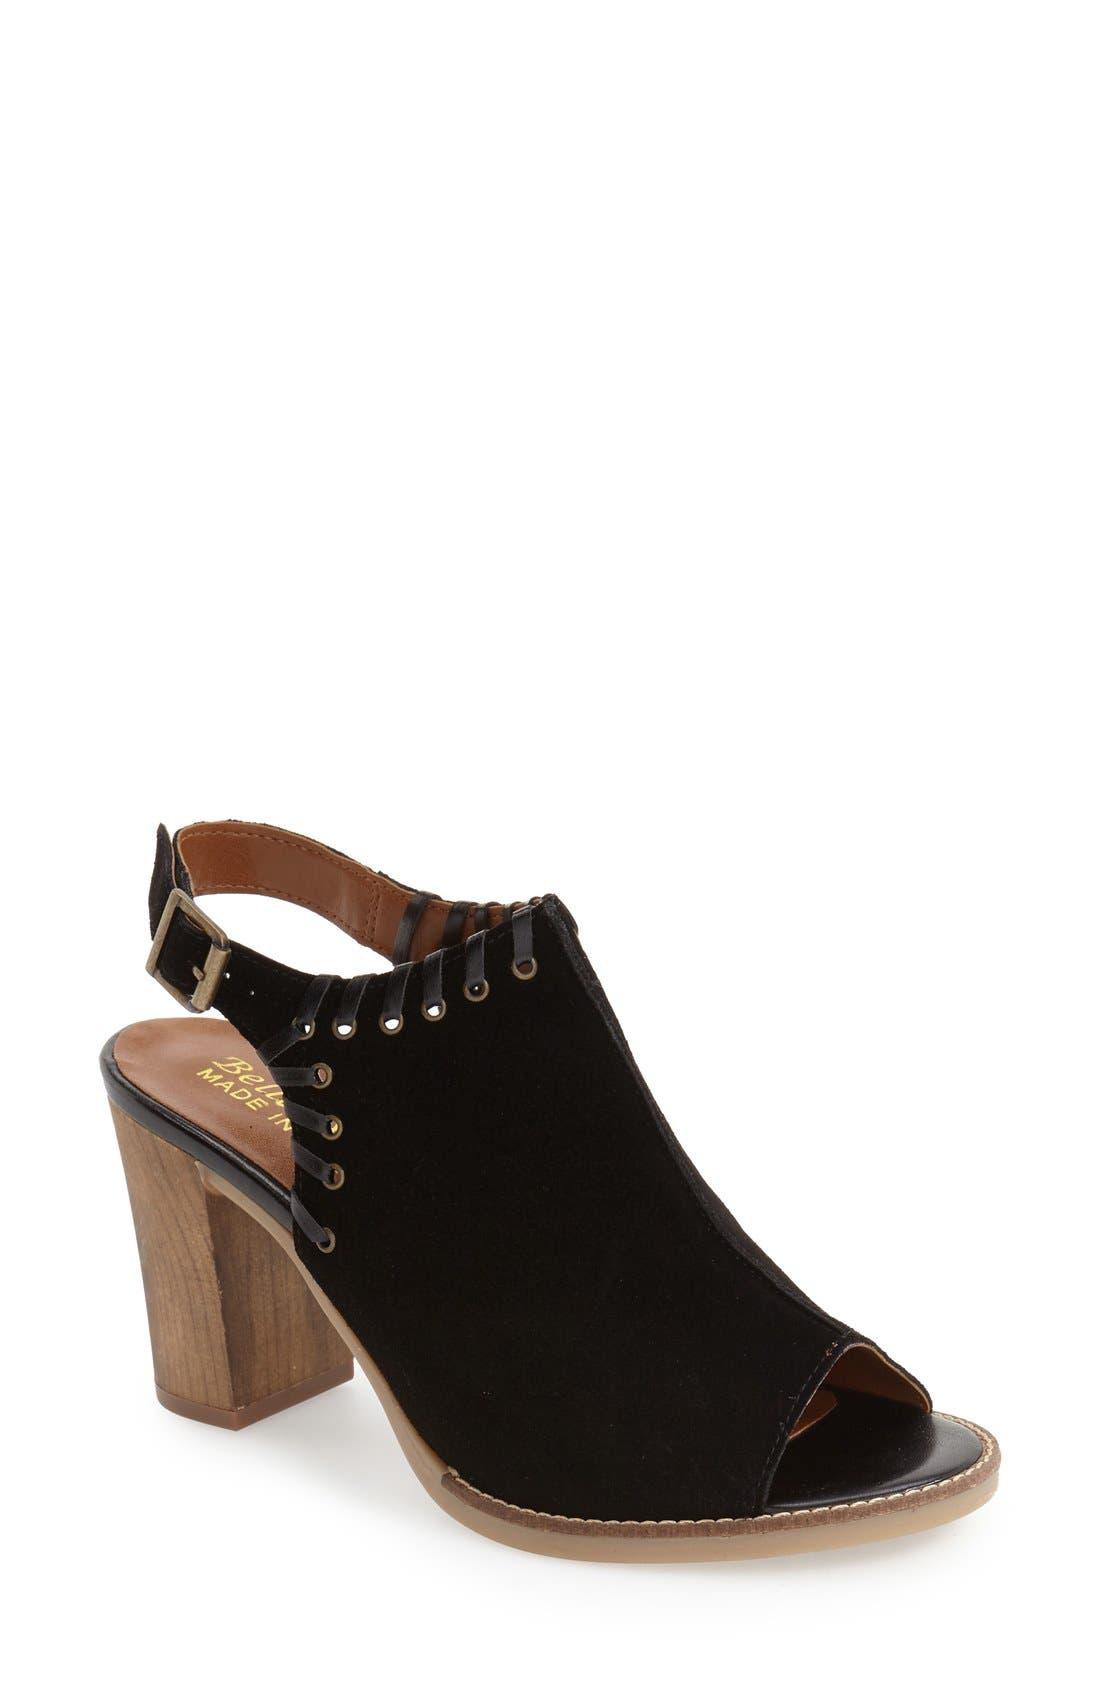 'Ora' Block Heel Slingback Sandal,                             Main thumbnail 1, color,                             Black Suede